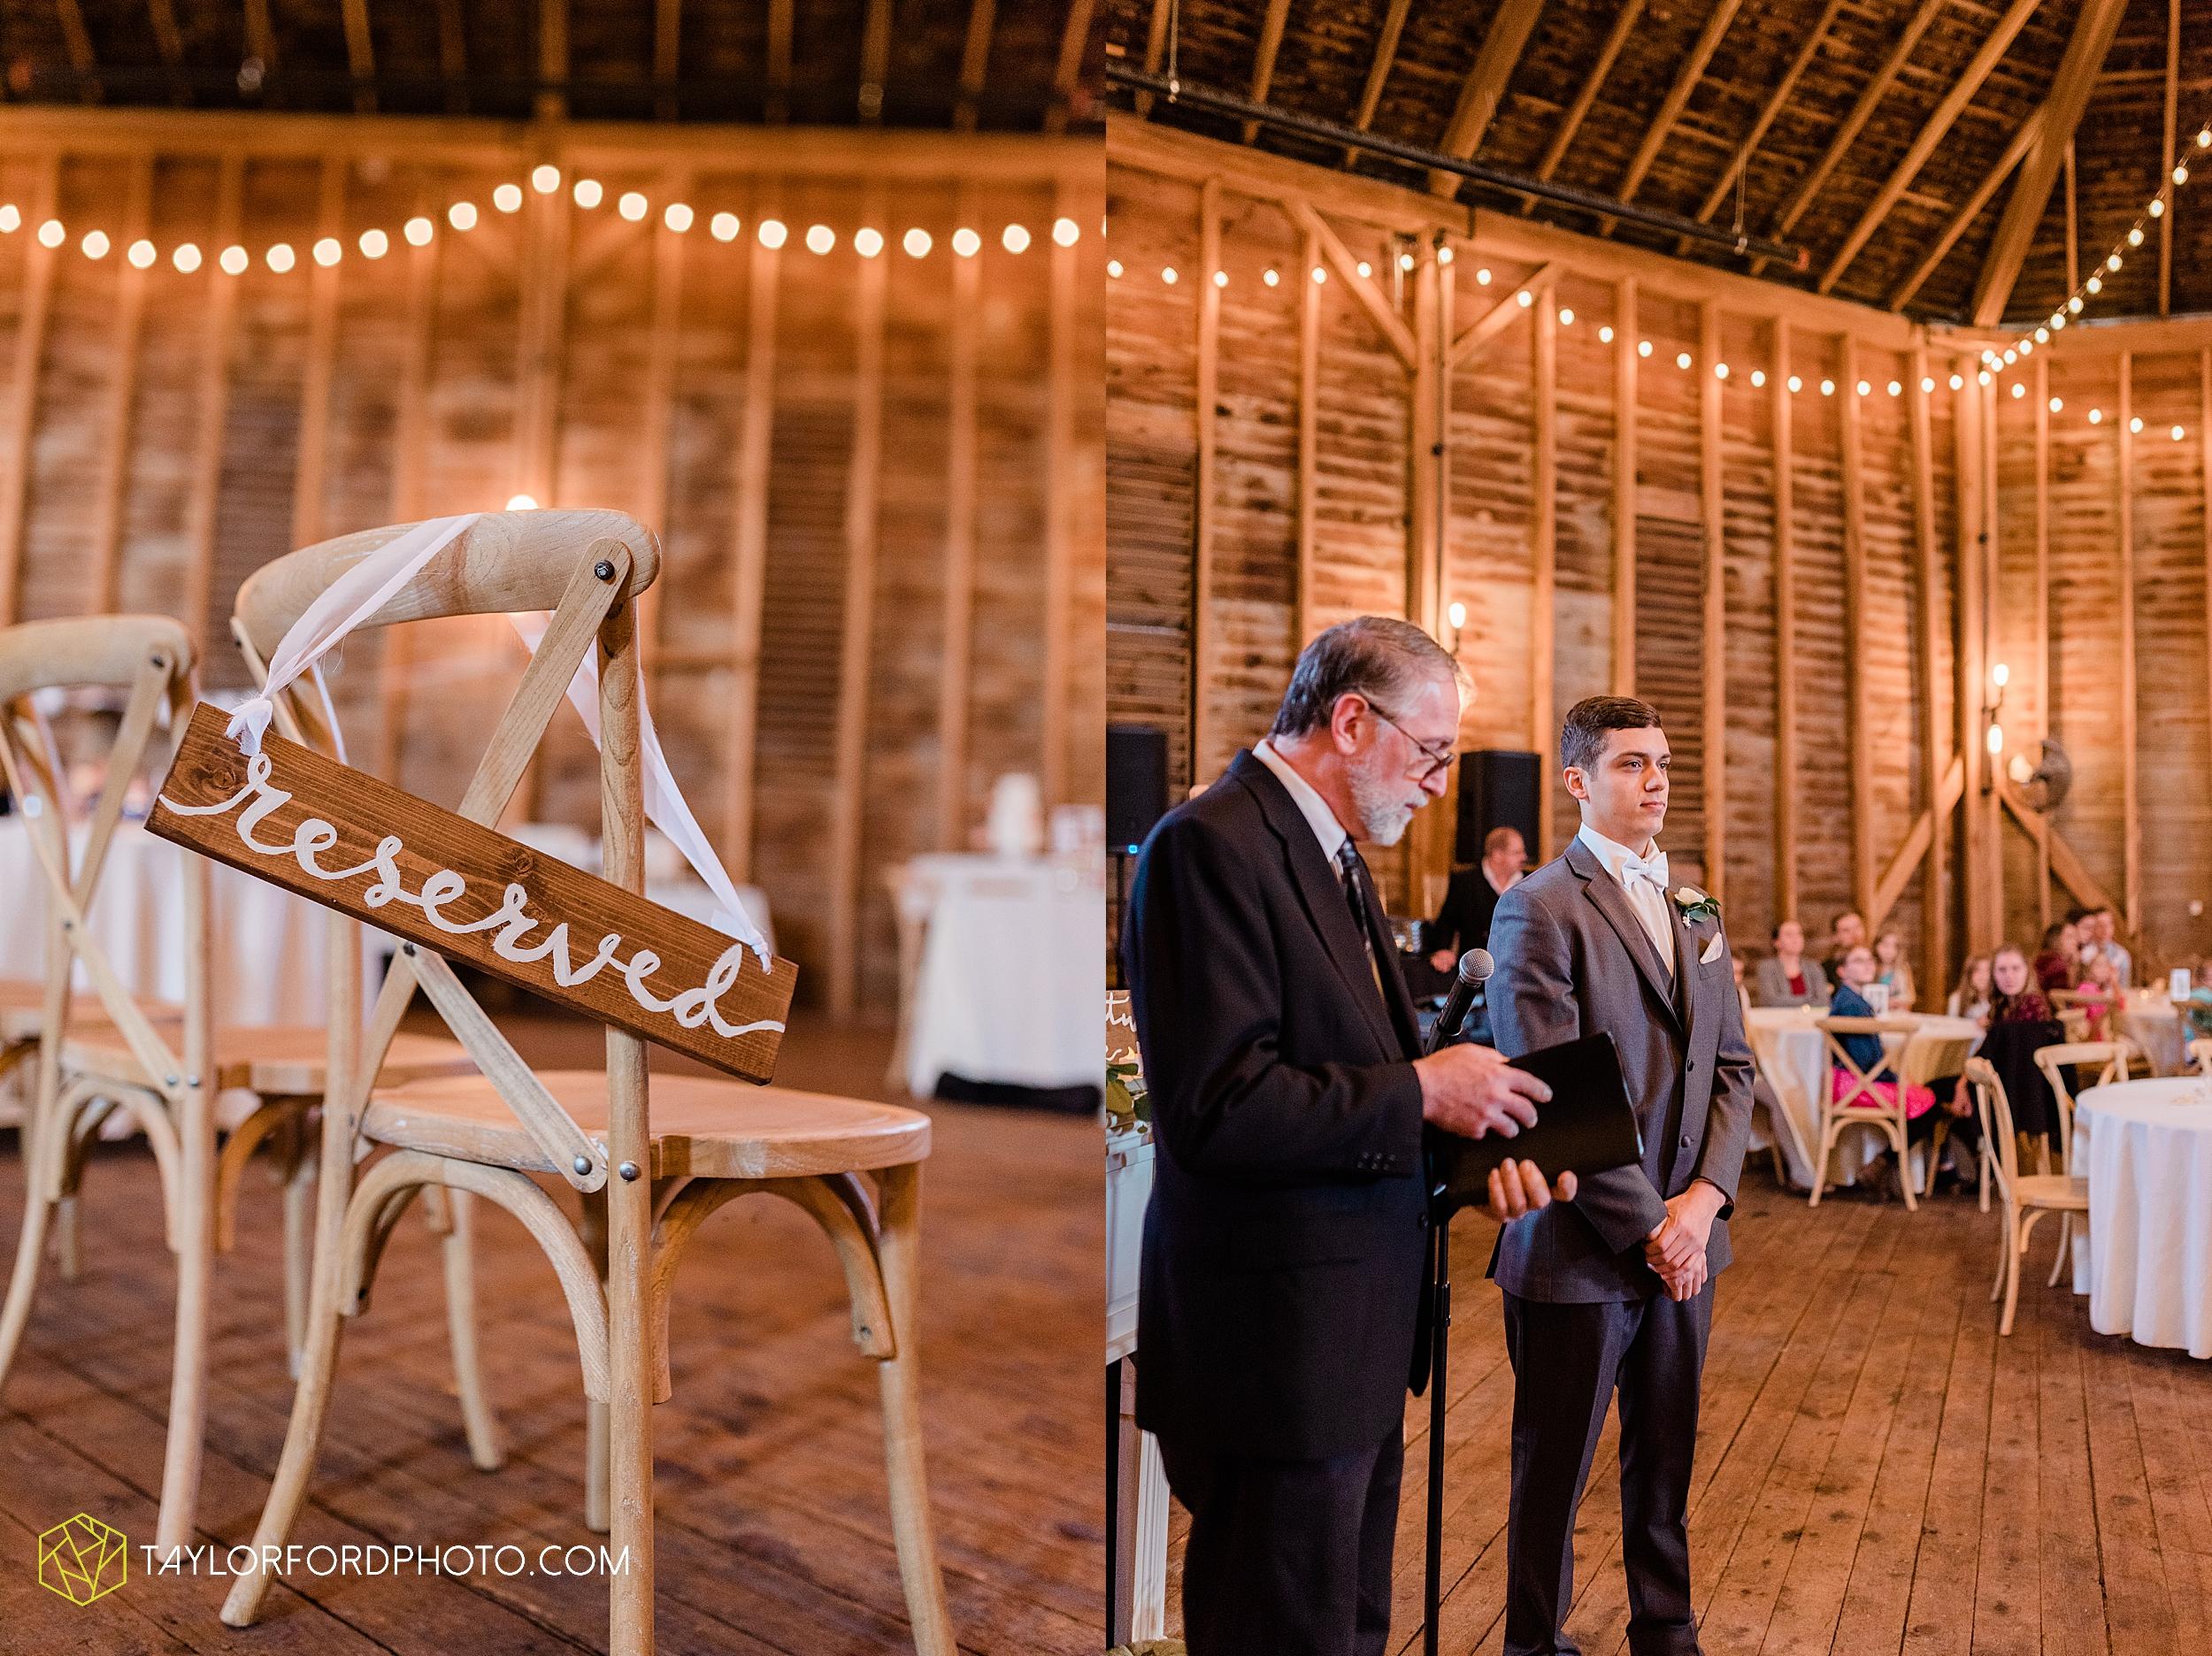 marissa-nicole-nick-daeger-orrmont-estate-farm-wedding-piqua-dayton-troy-ohio-fall-photographer-taylor-ford-photography_1521.jpg